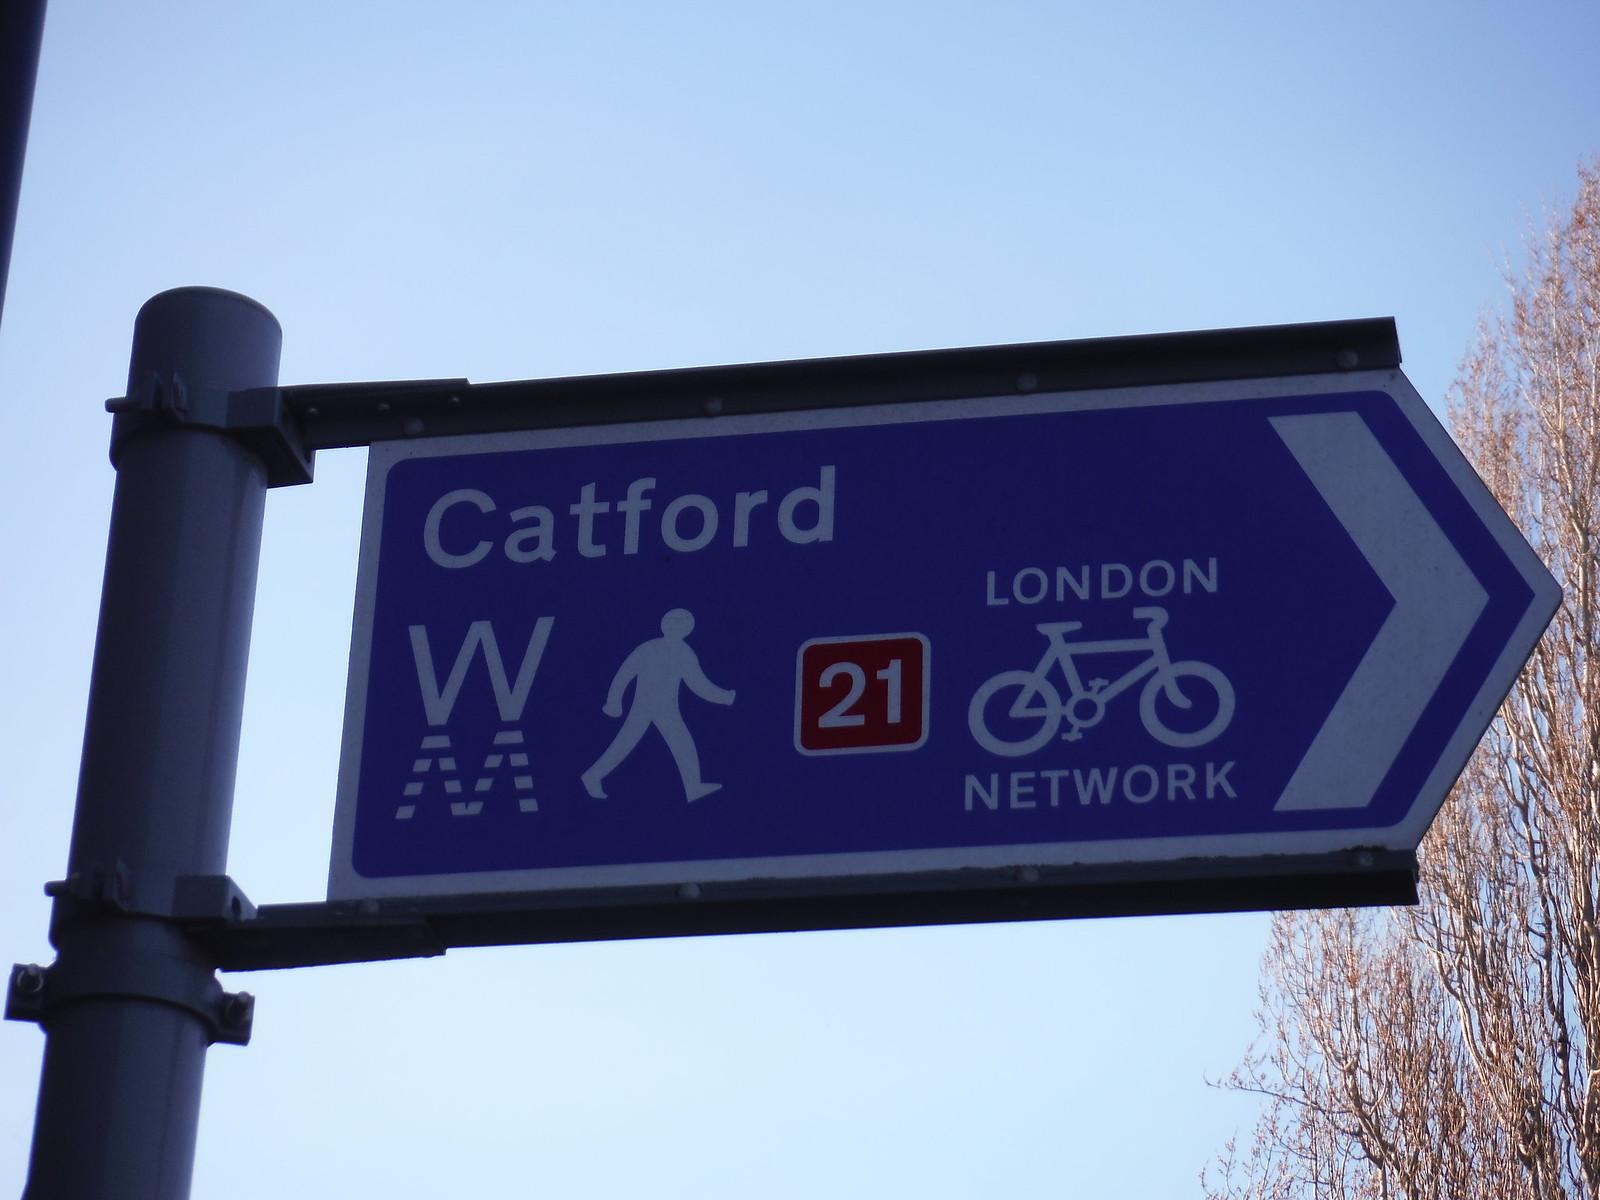 WW signpost by Lower Sydenham Station SWC Short Walk 36 - Waterlink Way (Lower Sydenham to Greenwich)